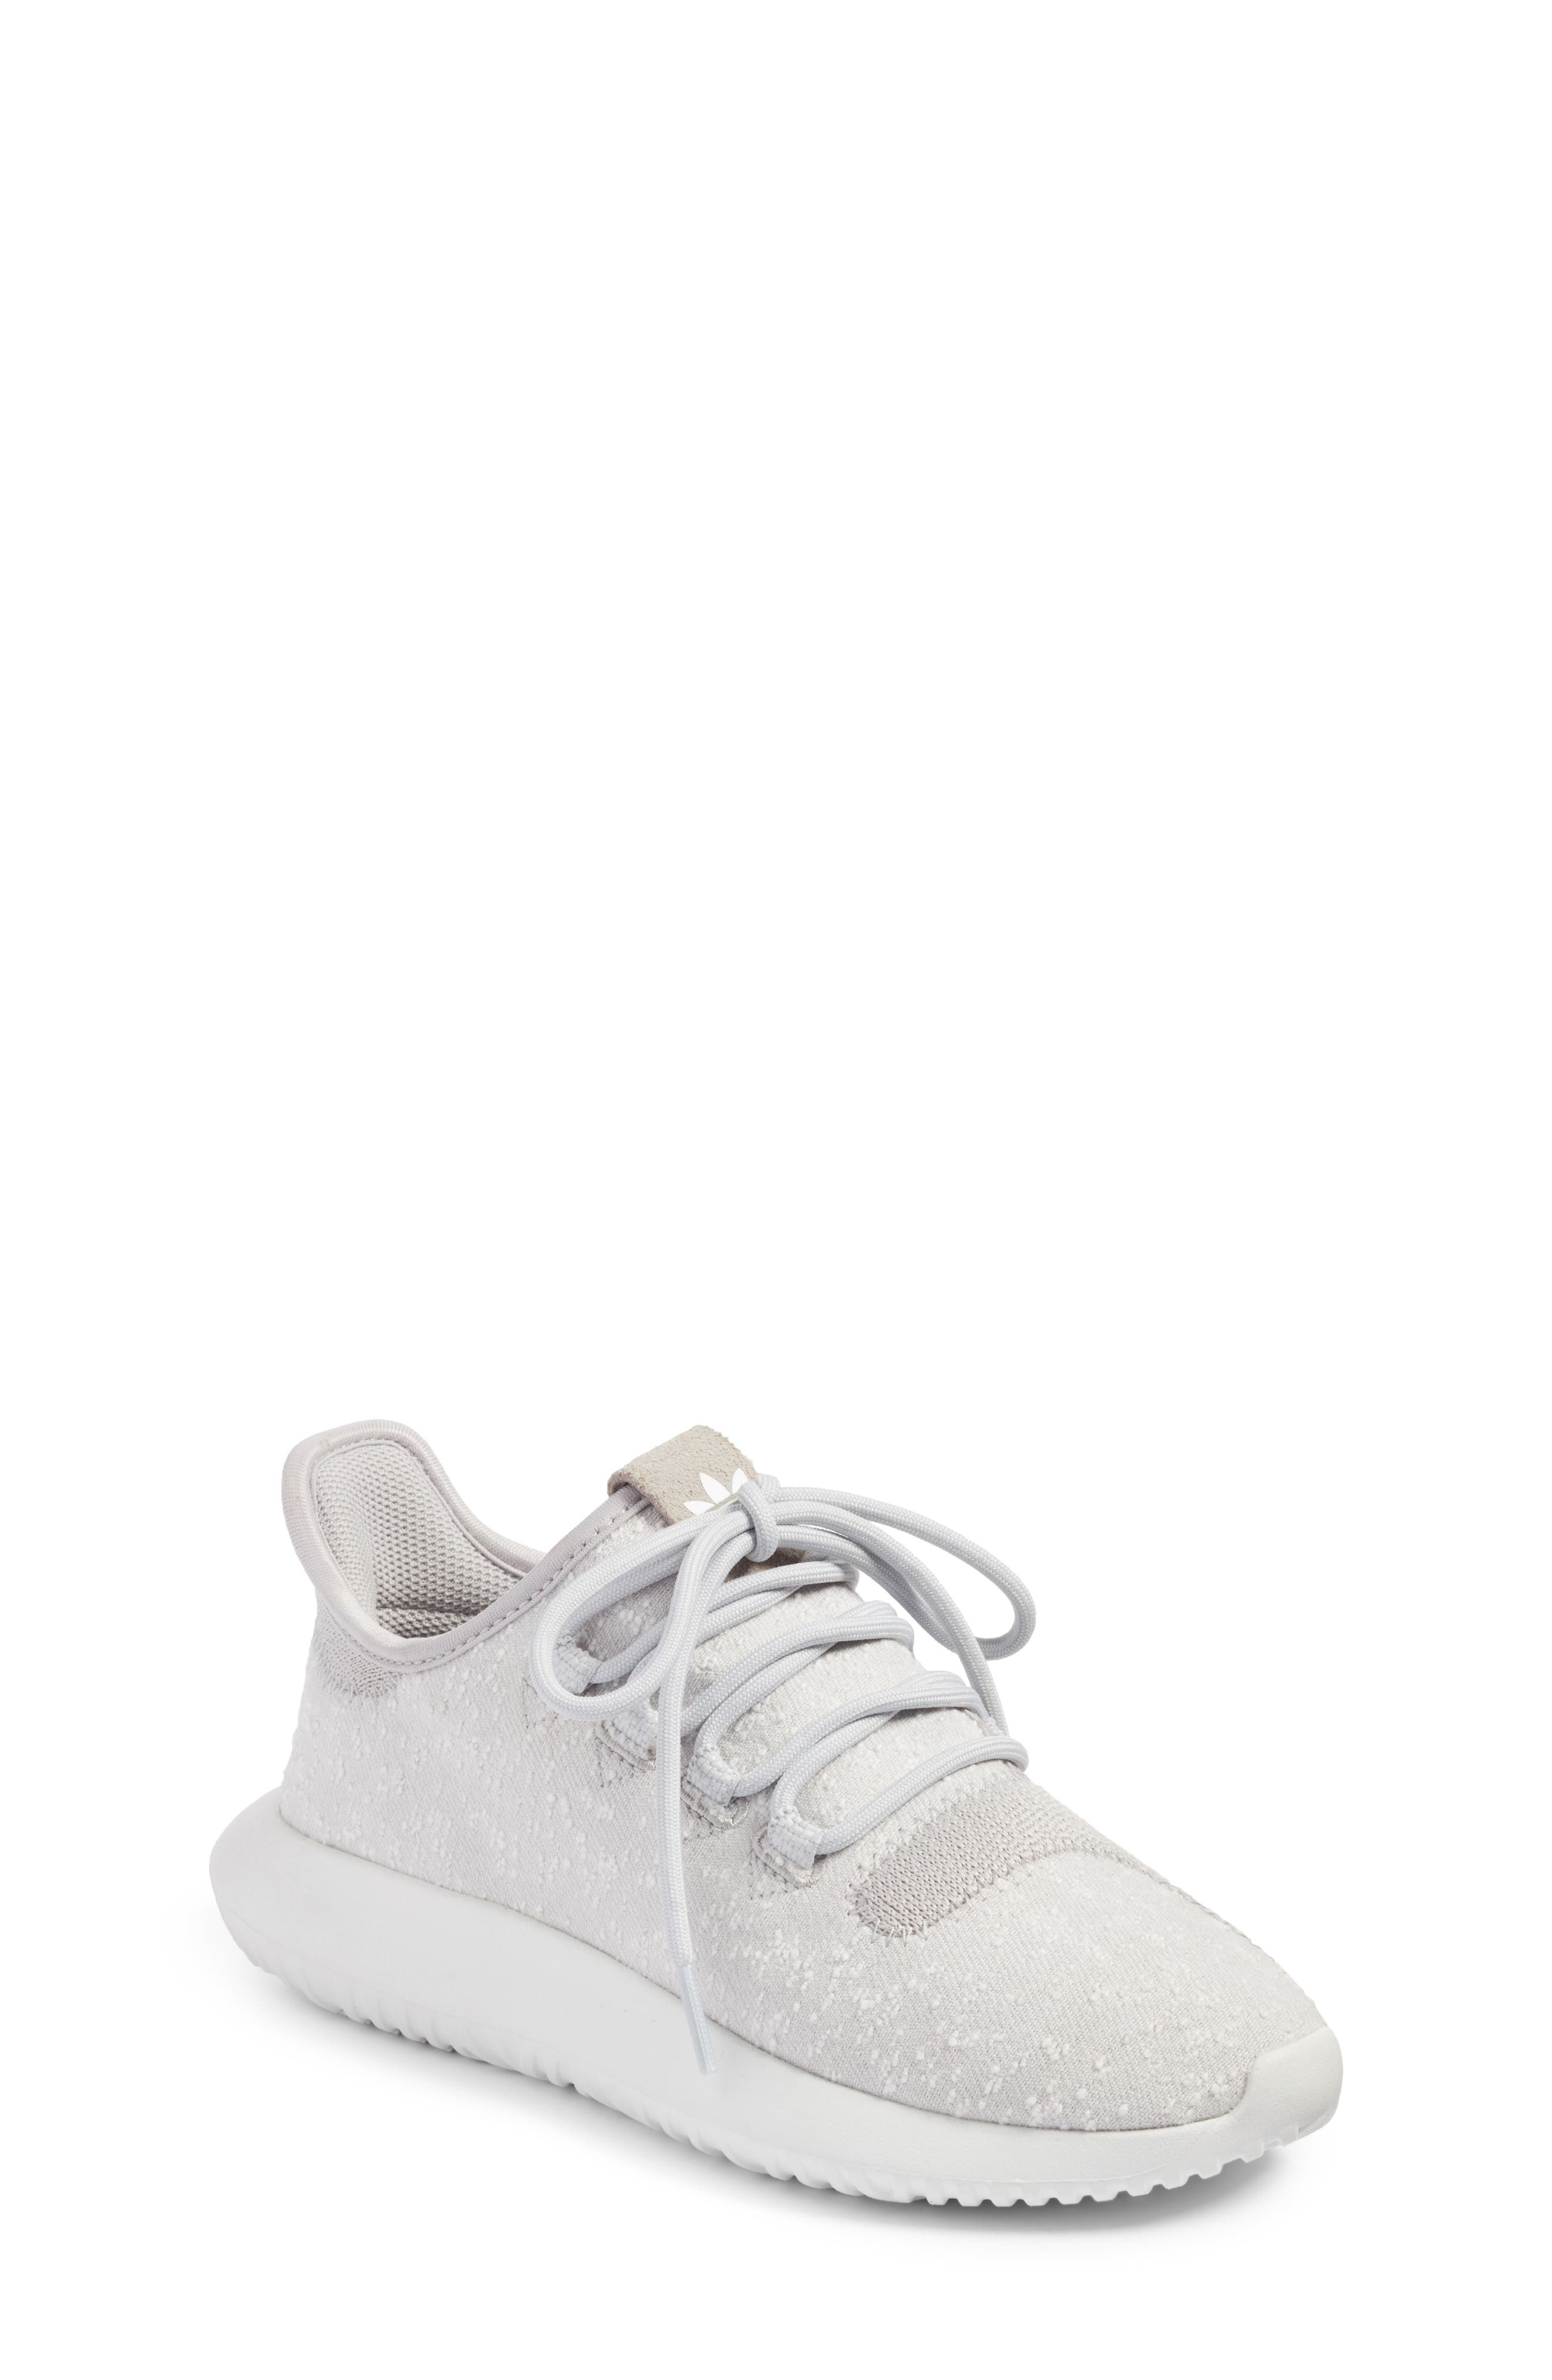 adidas Tubular Shadow Knit Sneaker (Big Kid)